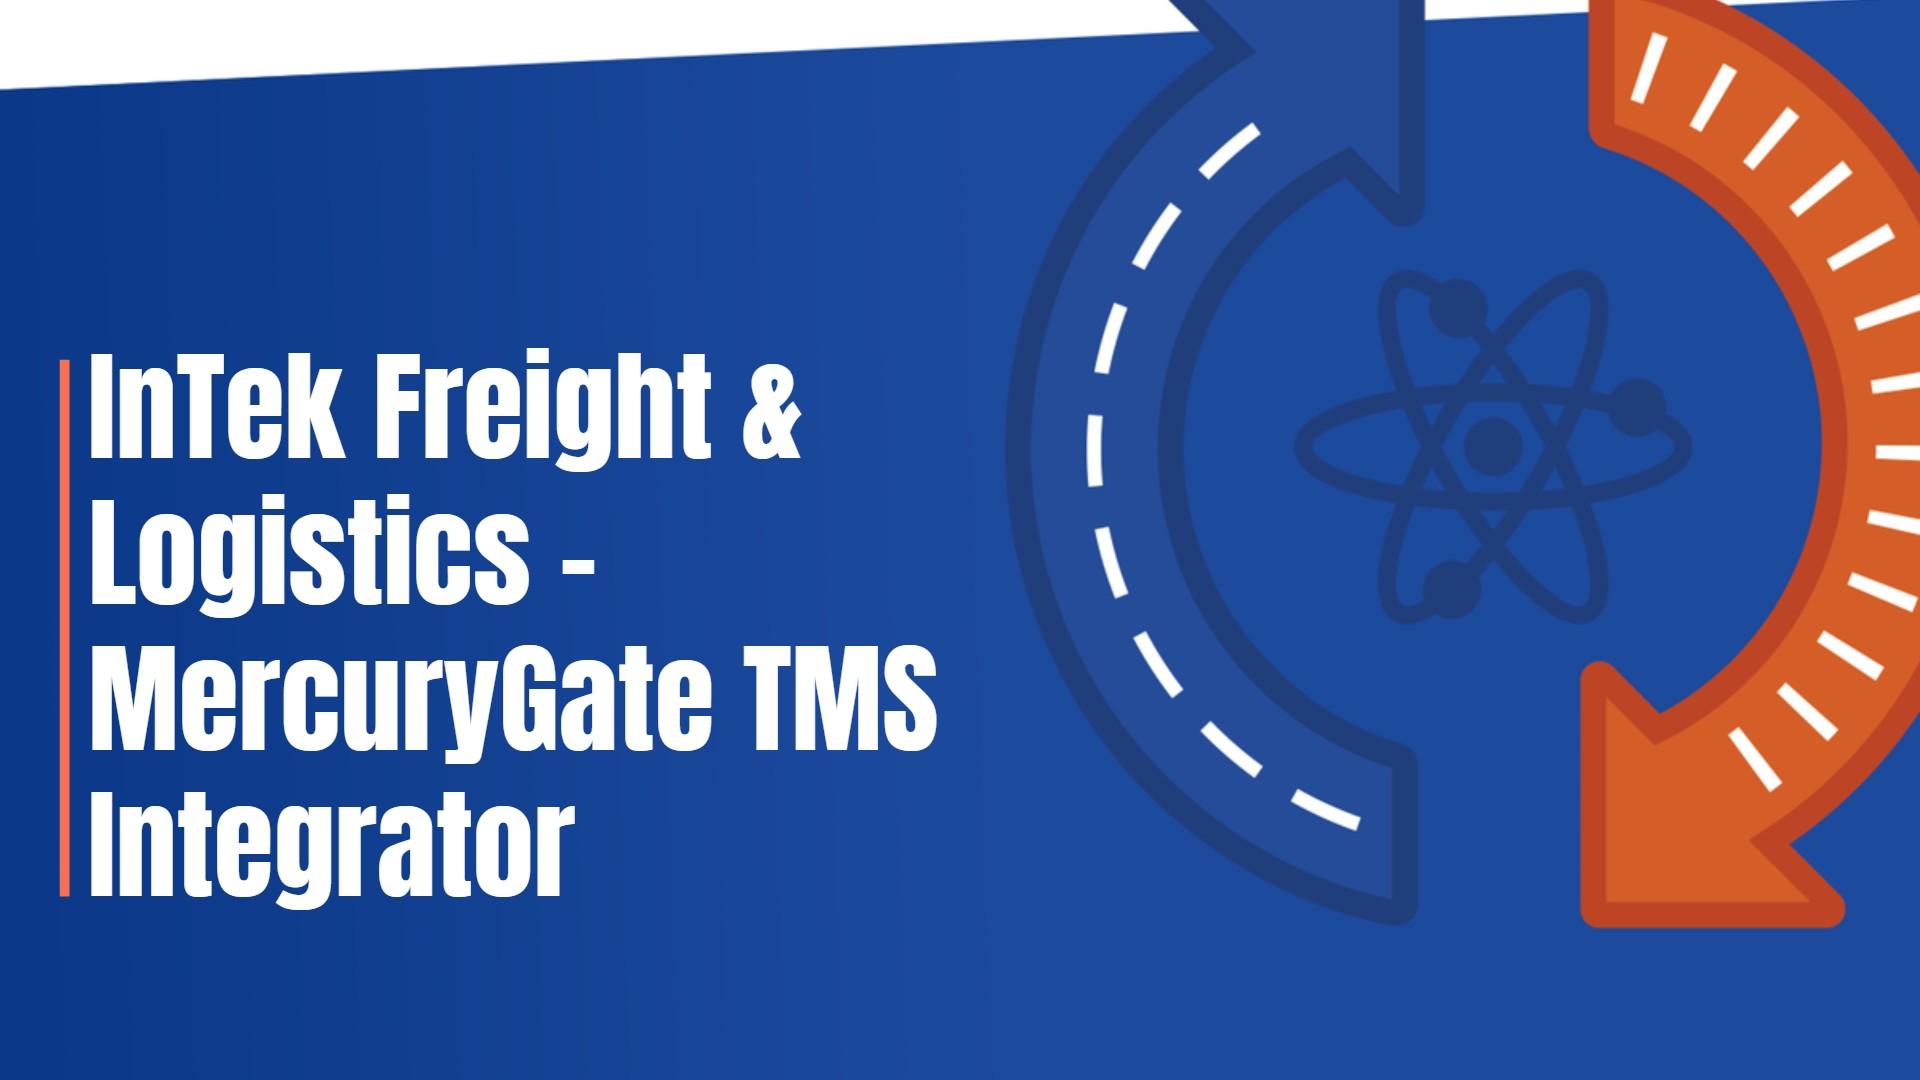 MercuryGate TMS Integrator